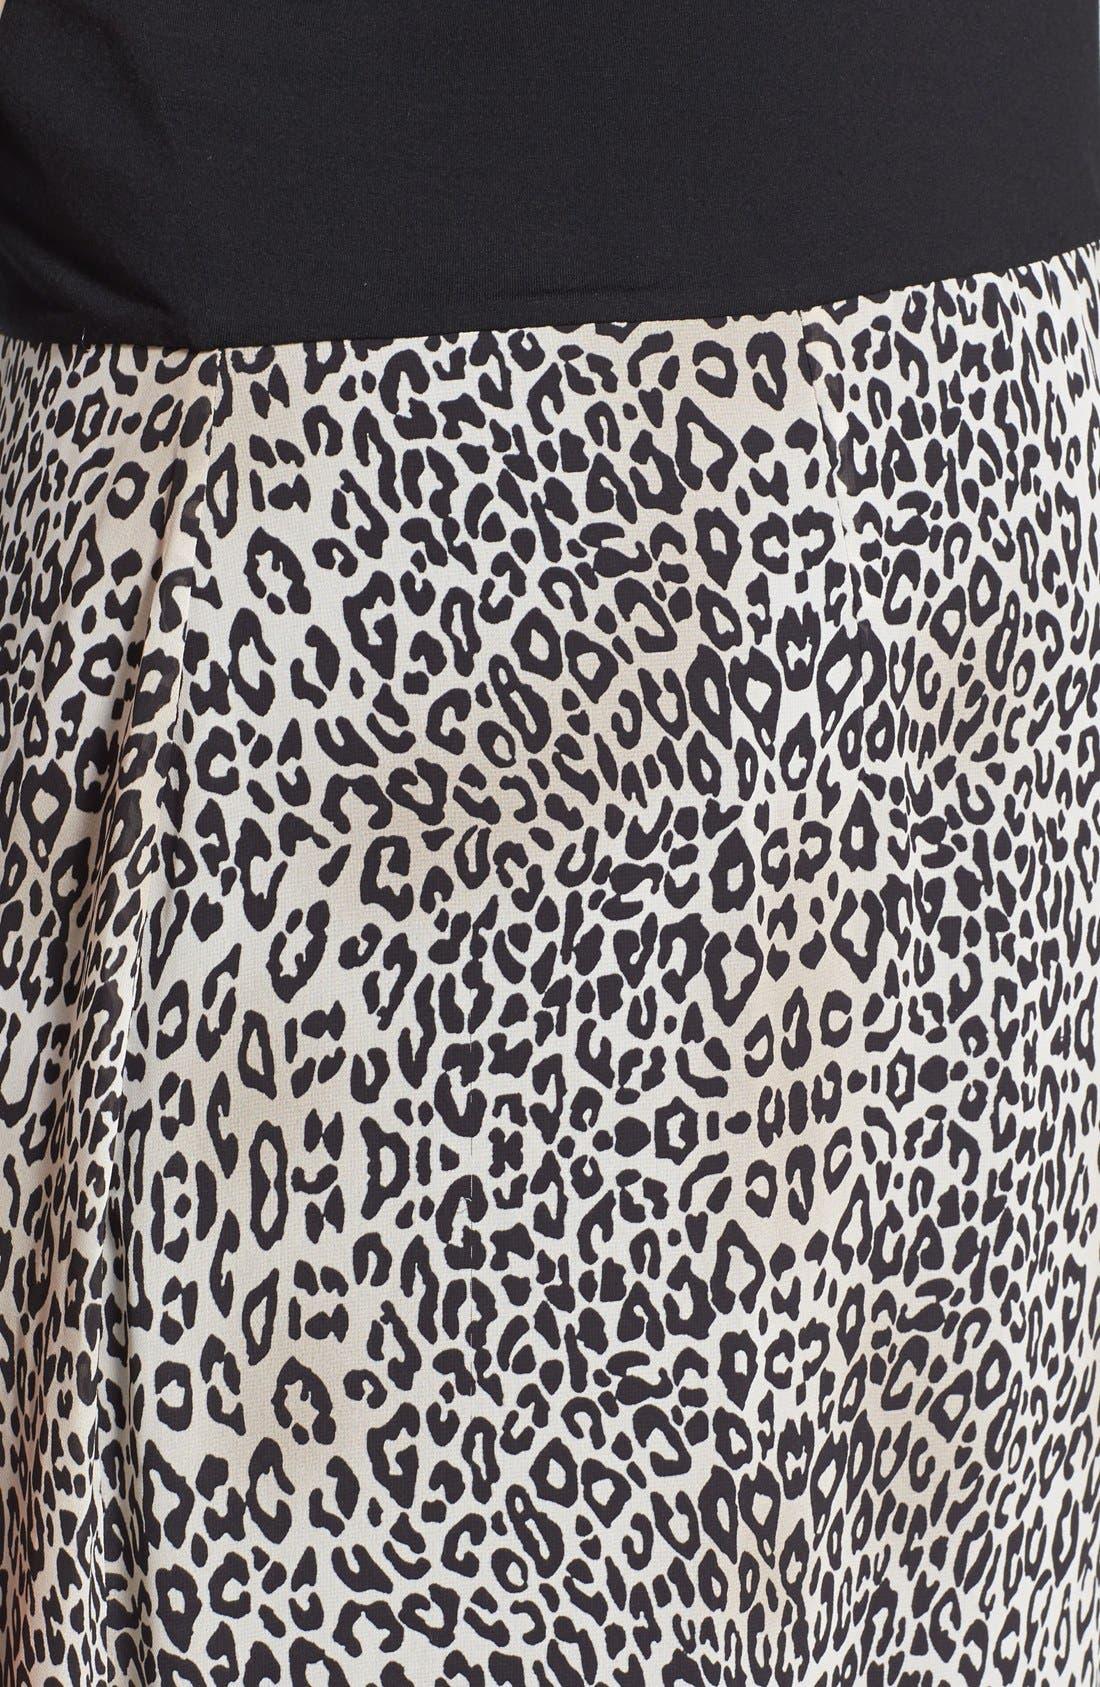 Alternate Image 3  - Vince Camuto 'Desert Leopard' Chiffon Overlay Maxi Dress (Plus Size)